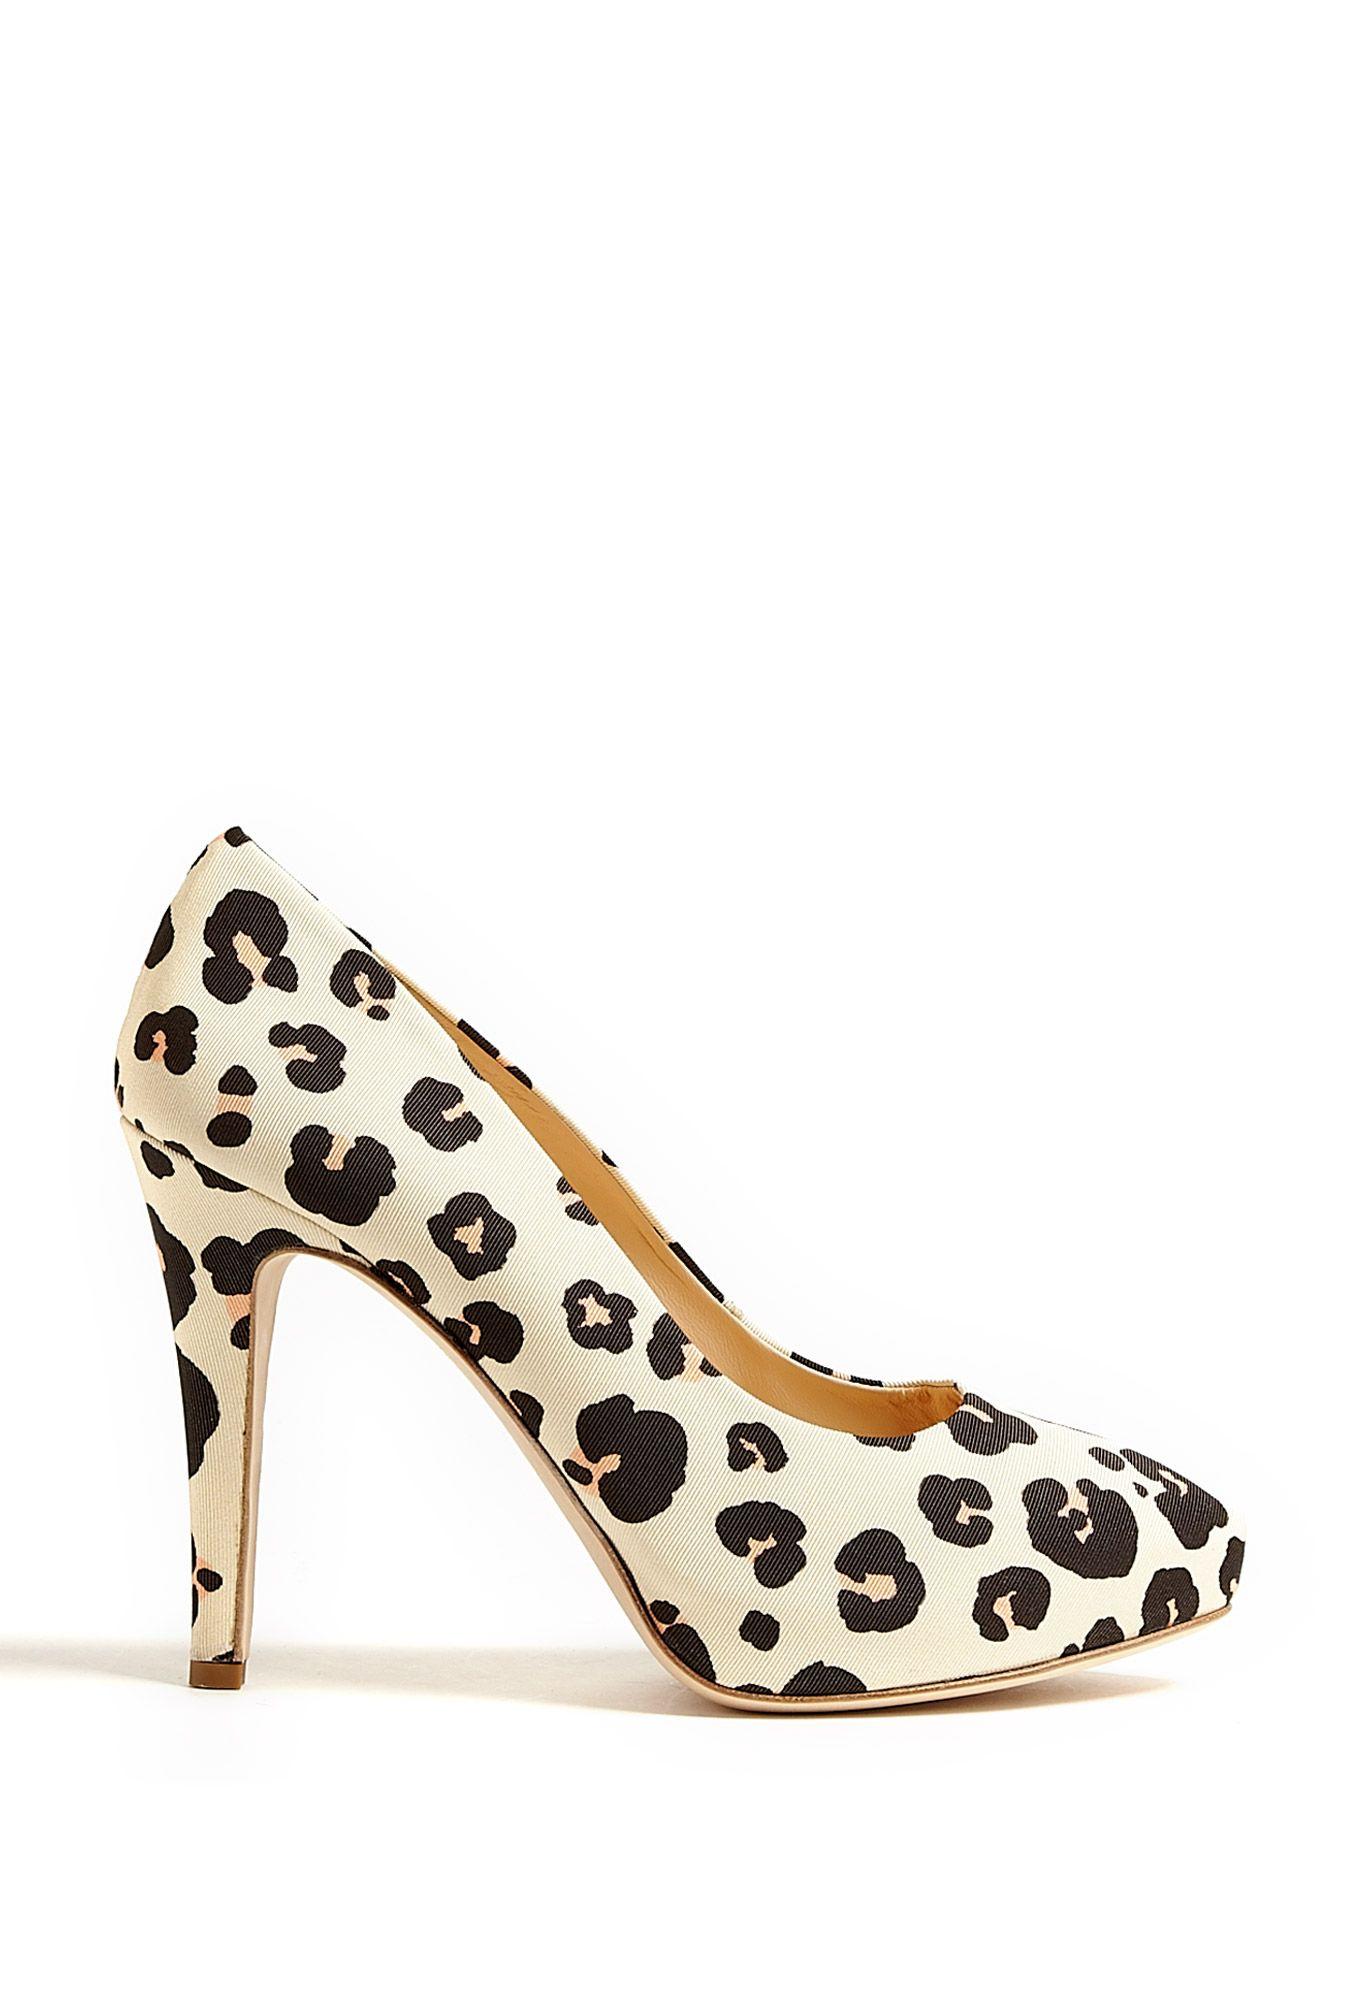 9e7cf588d97 animal print shoes